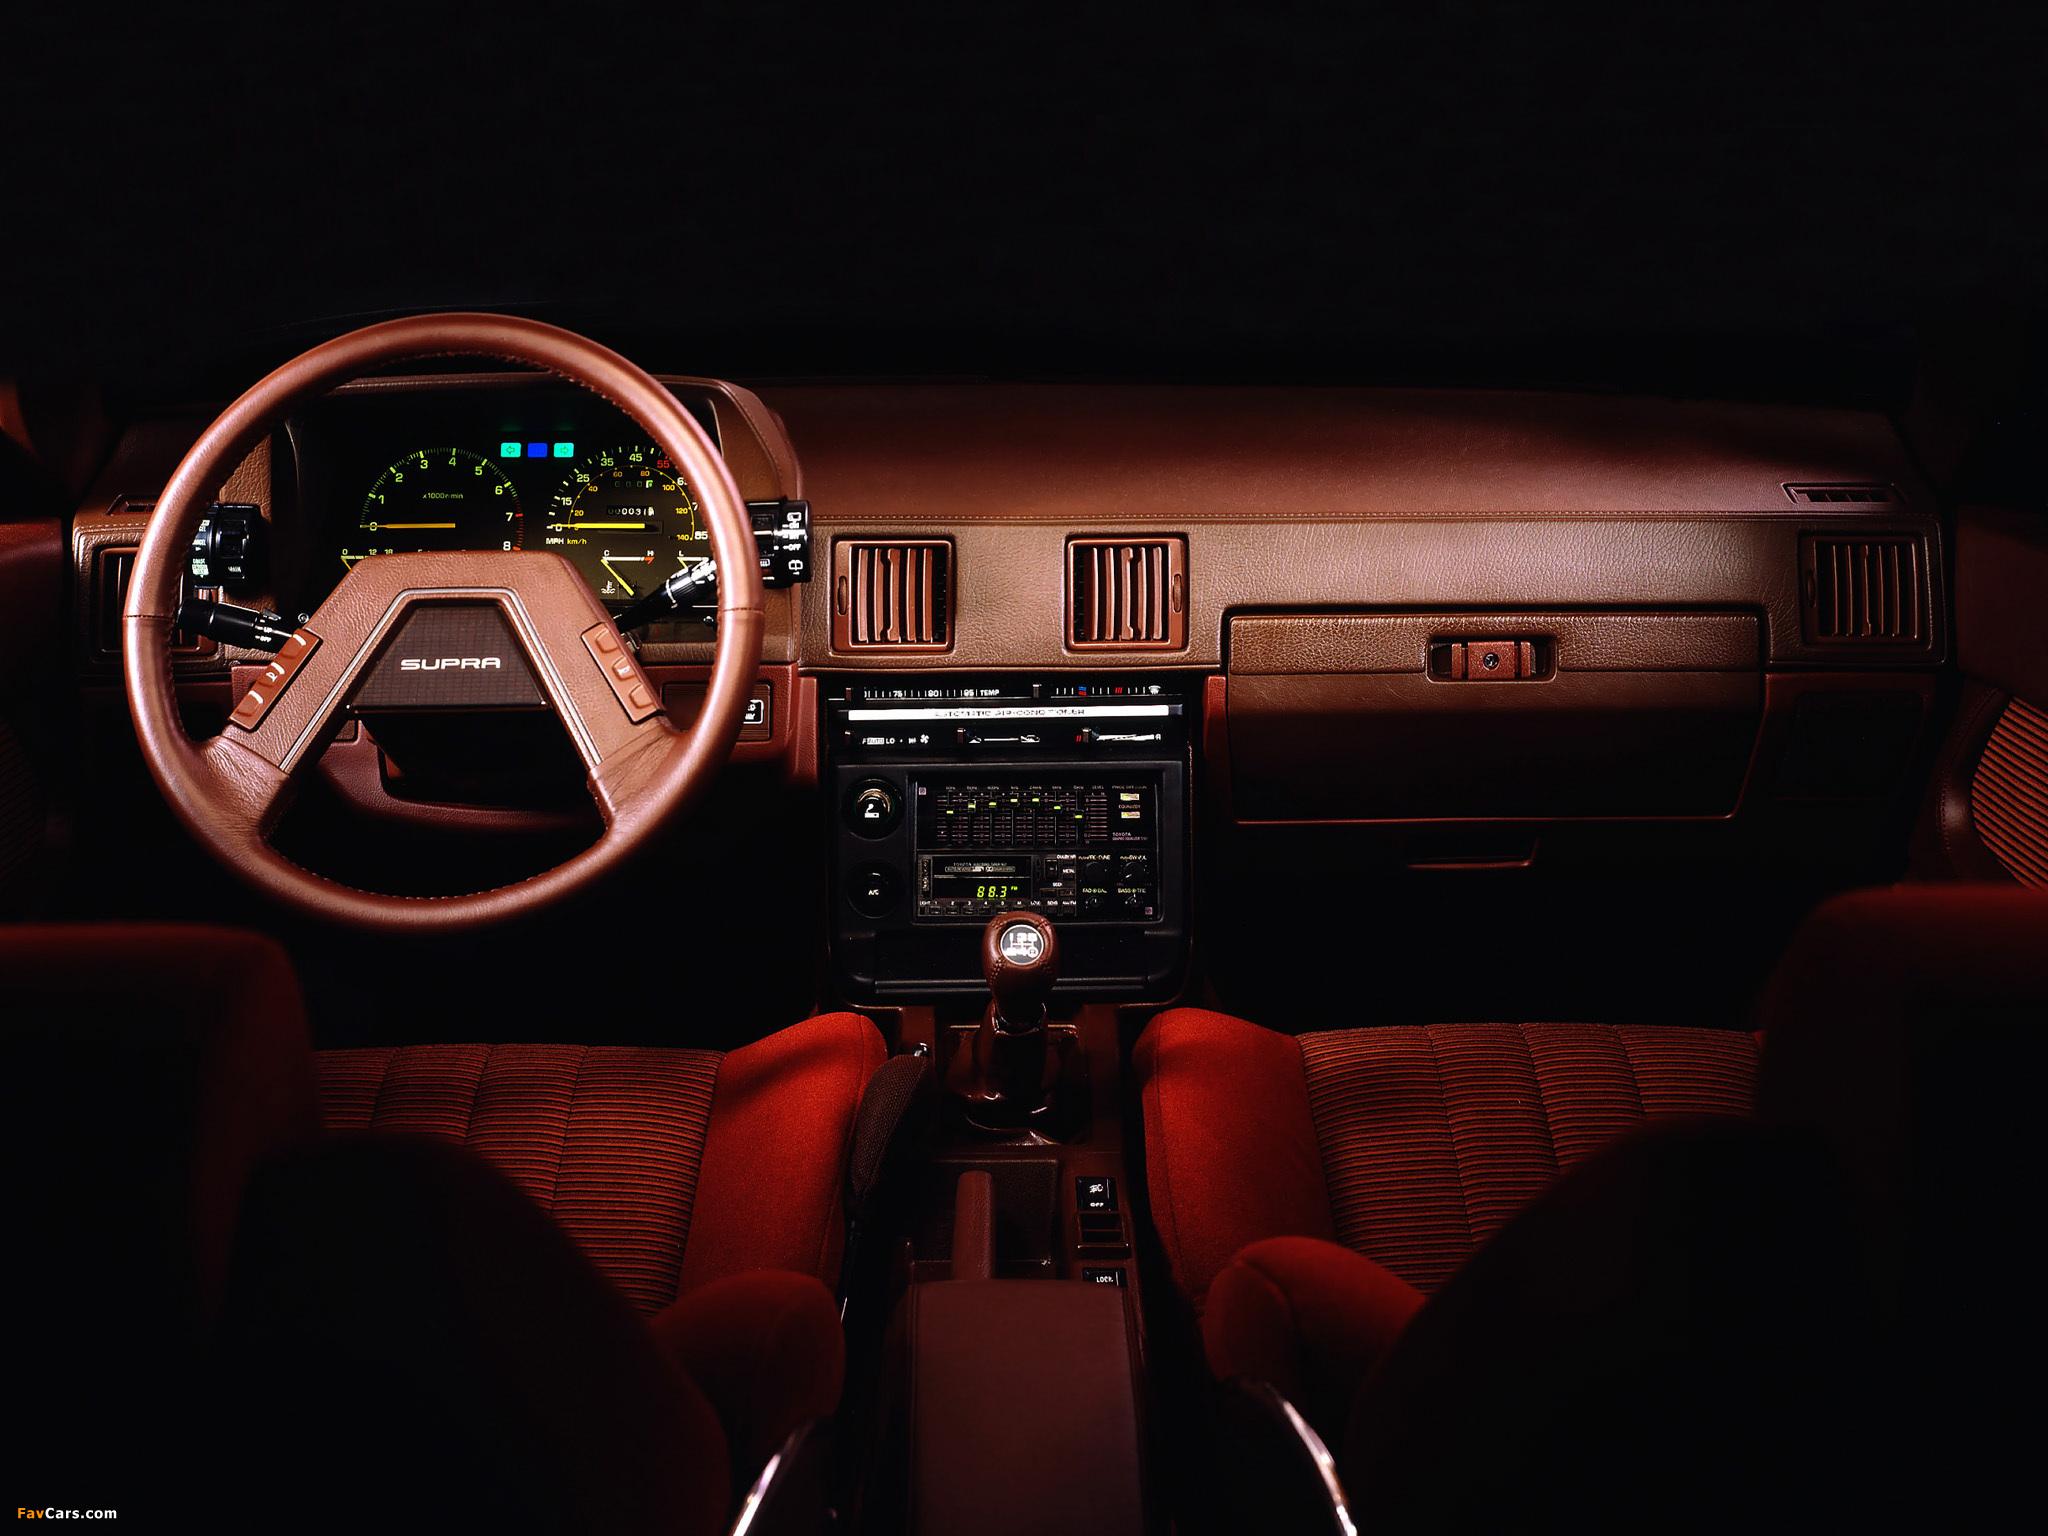 Toyota Celica Supra Ma61 1982 84 Wallpapers 2048x1536